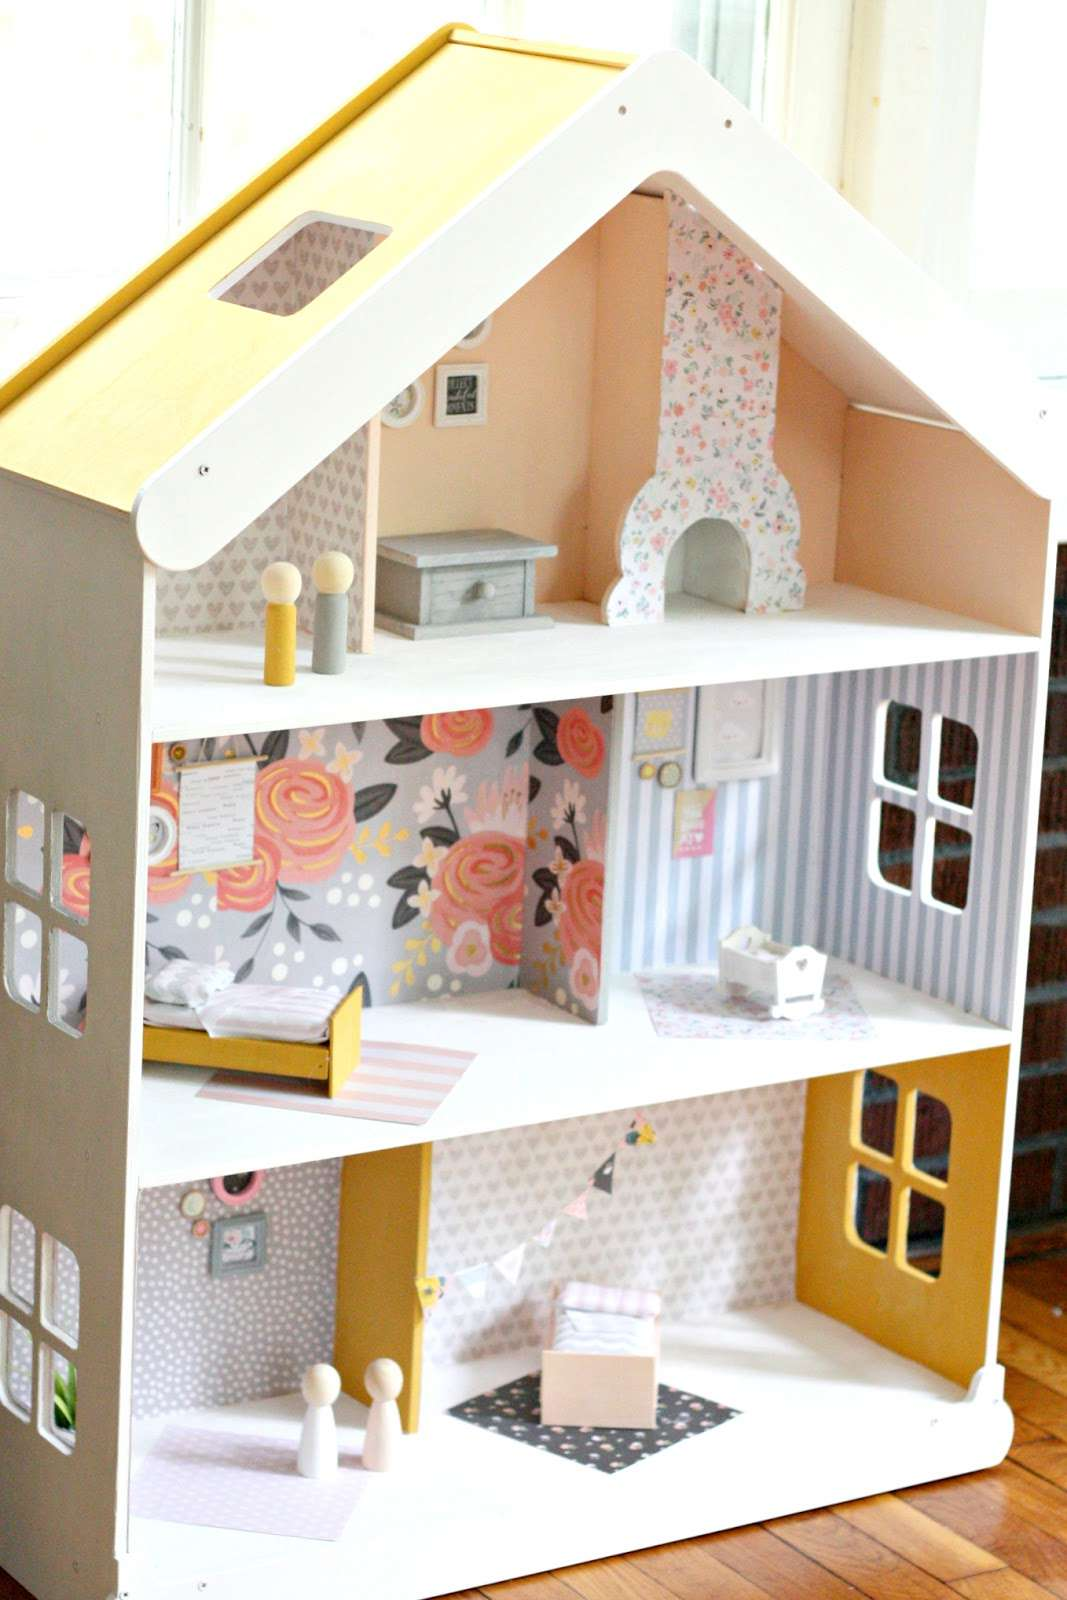 The inside of a modern DIY dollhouse